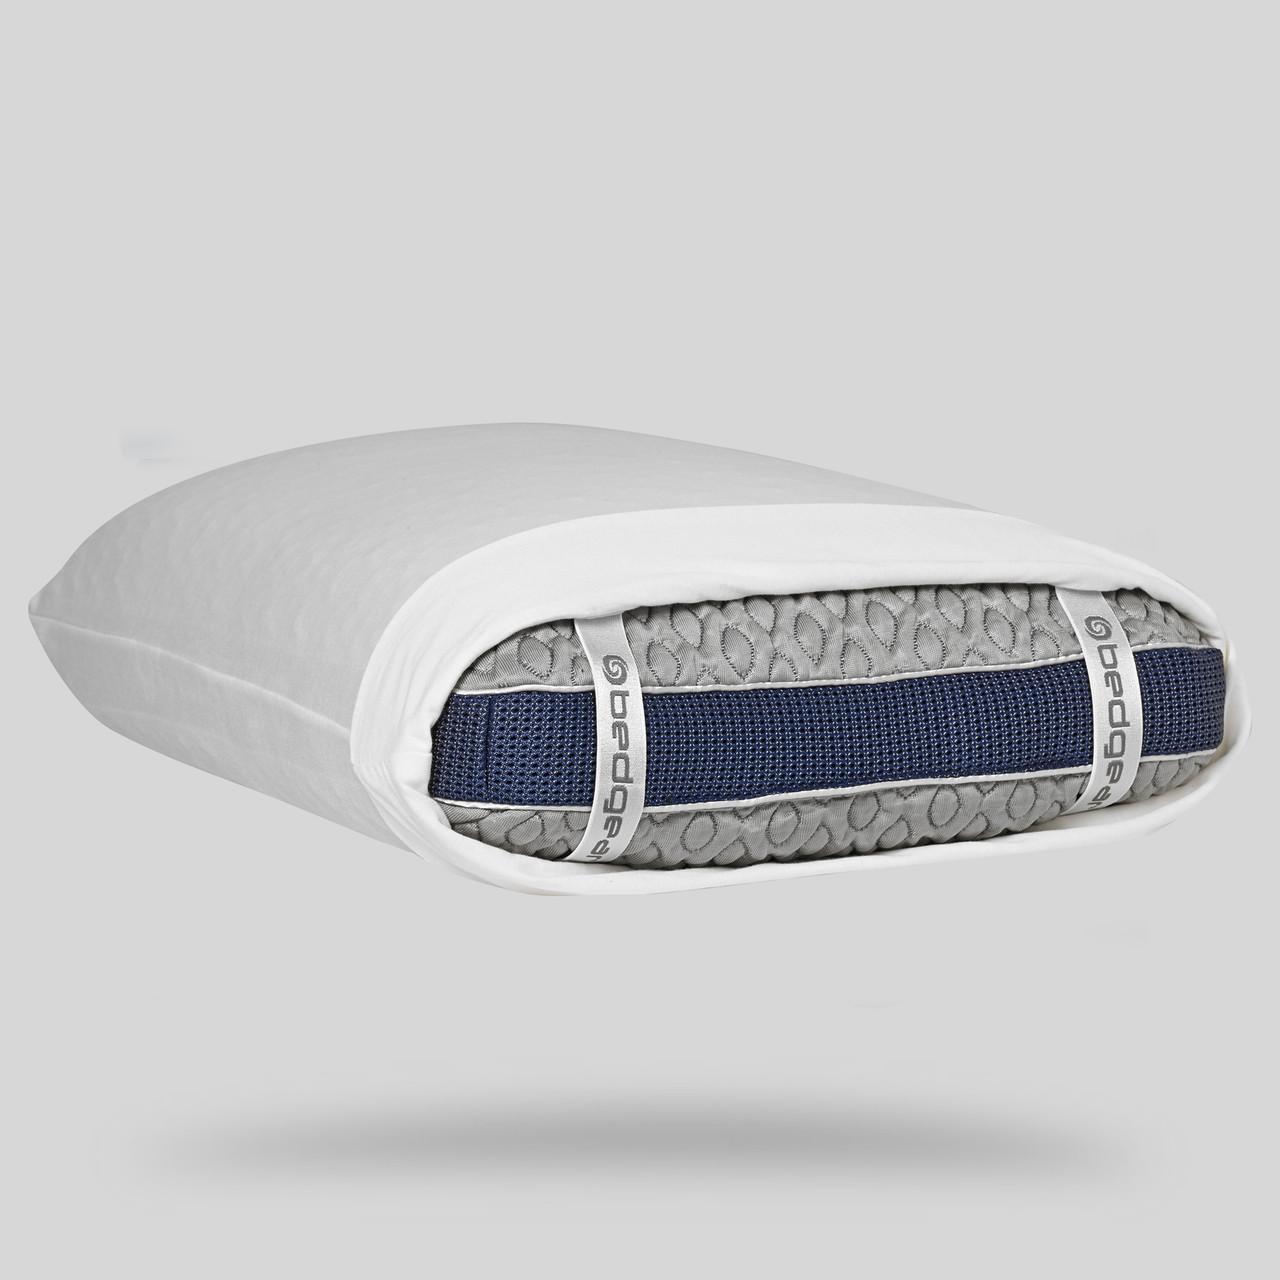 Bedgear Hyper-Wool Technology Performance Wool Powerband Pillowcase